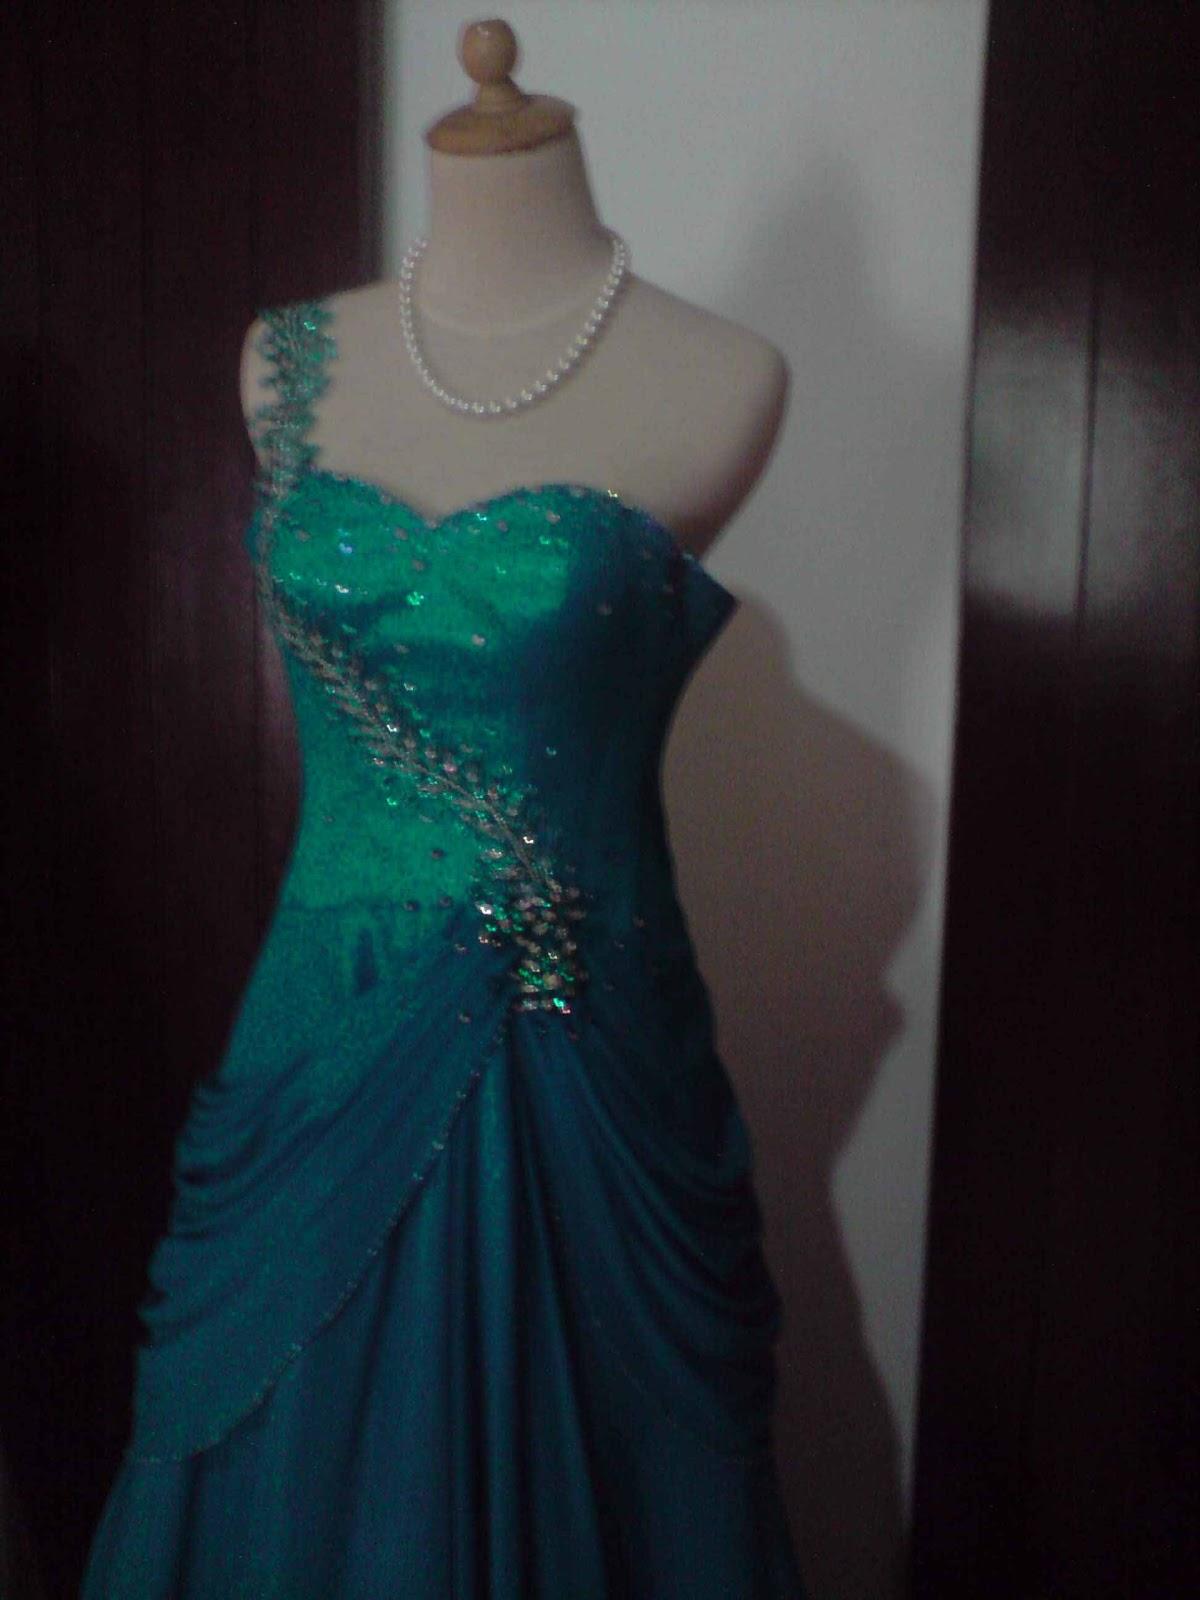 gaun pengantin organdi priscetan idr 3 500 000 all in gaun malam biru